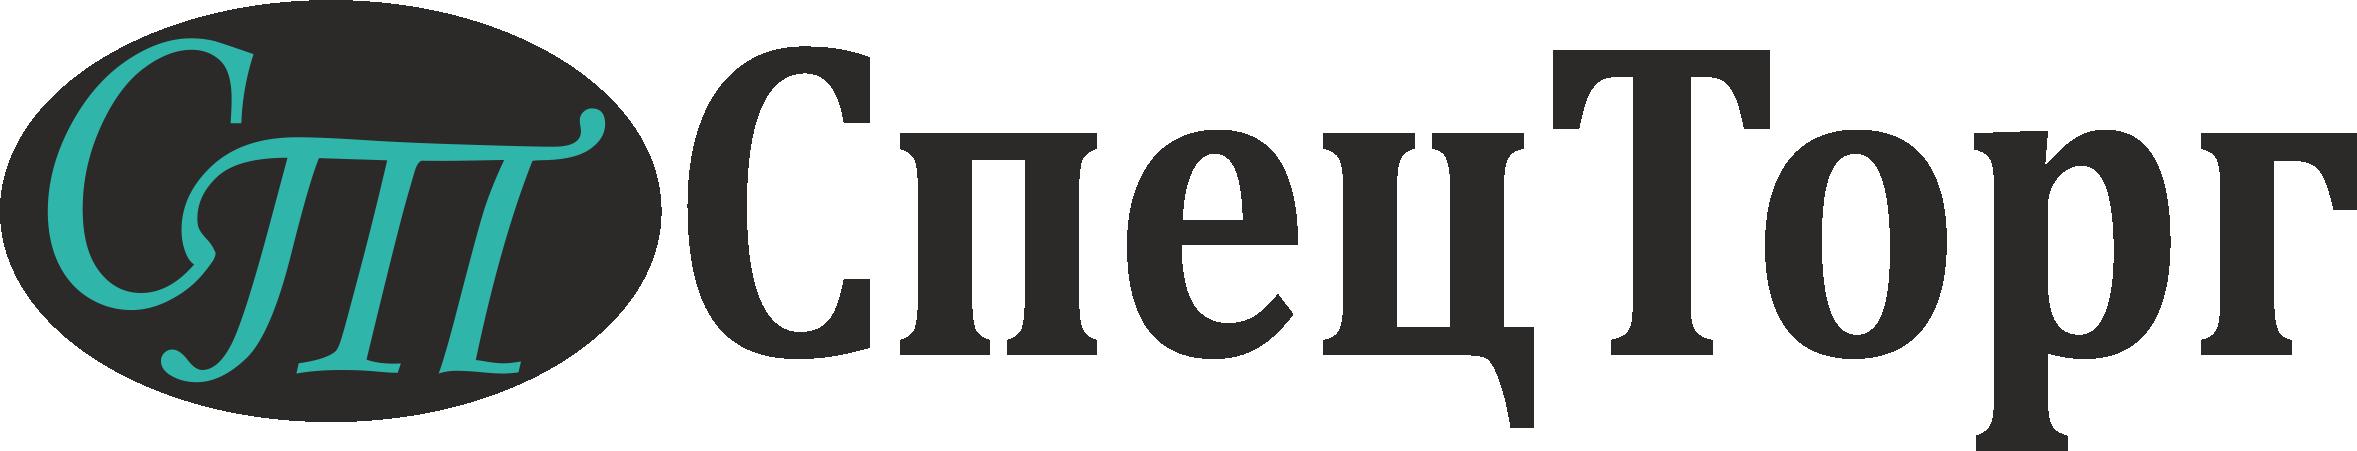 Разработать дизайн  логотипа компании фото f_4955dd1208c06cd2.png